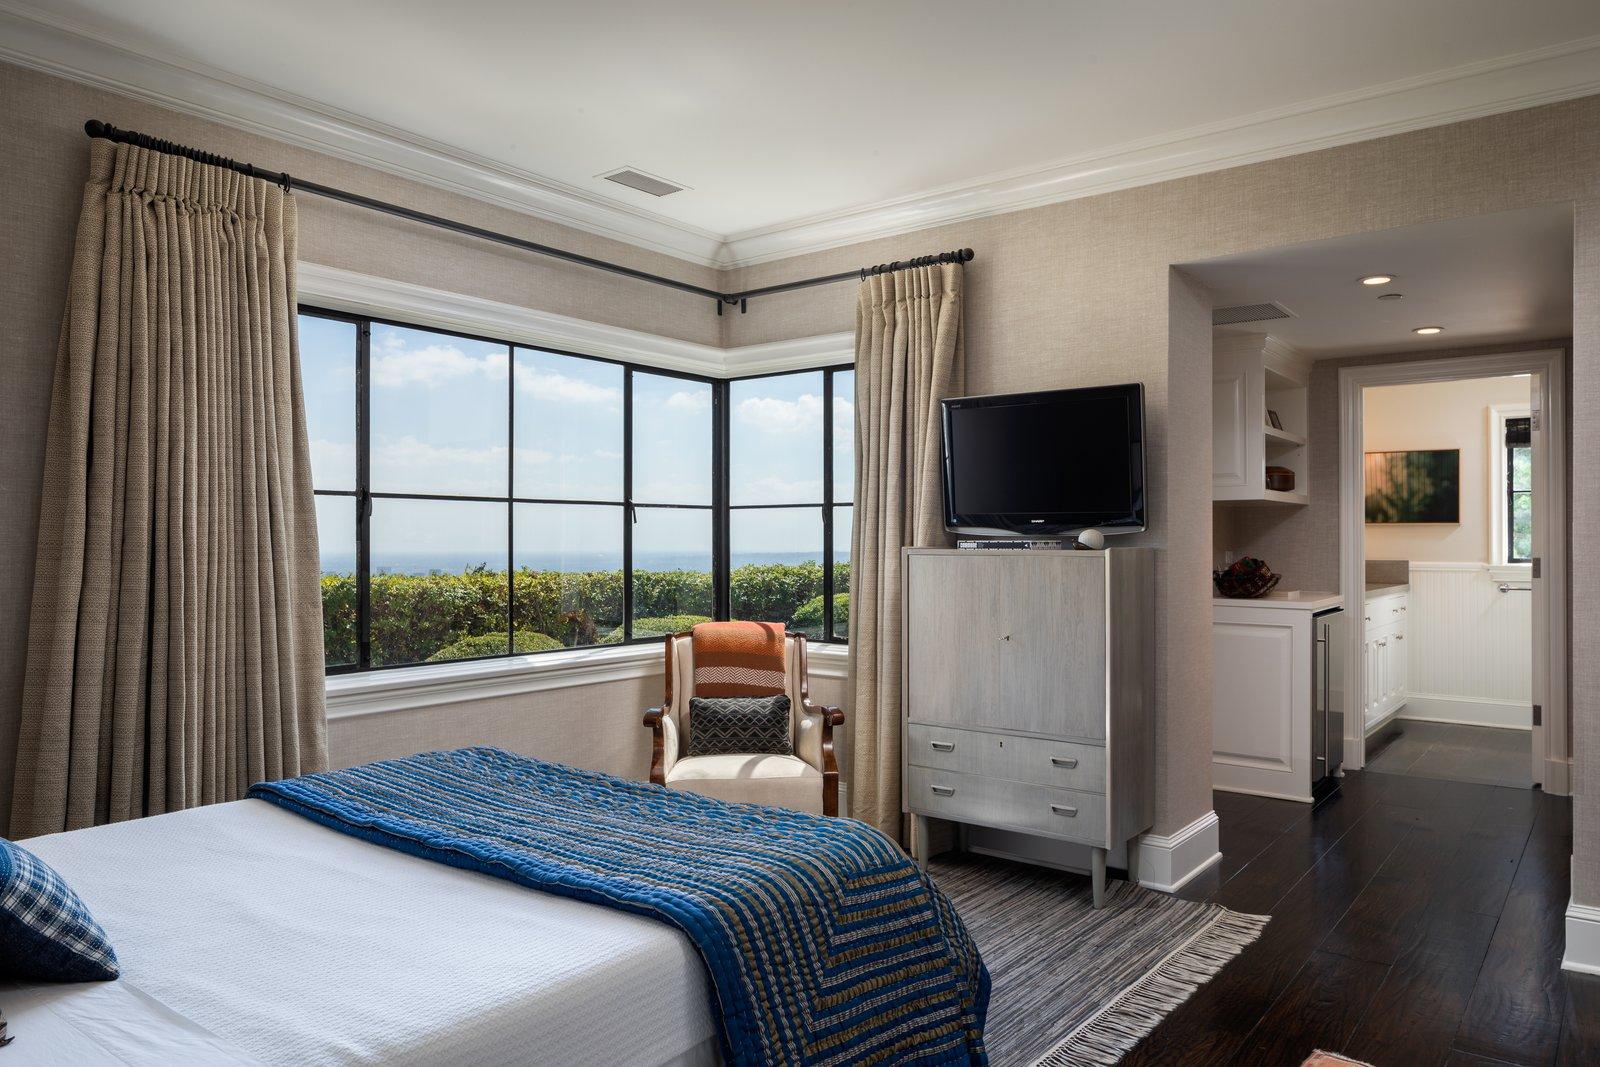 Jodie Foster Beverly Hills home bedroom